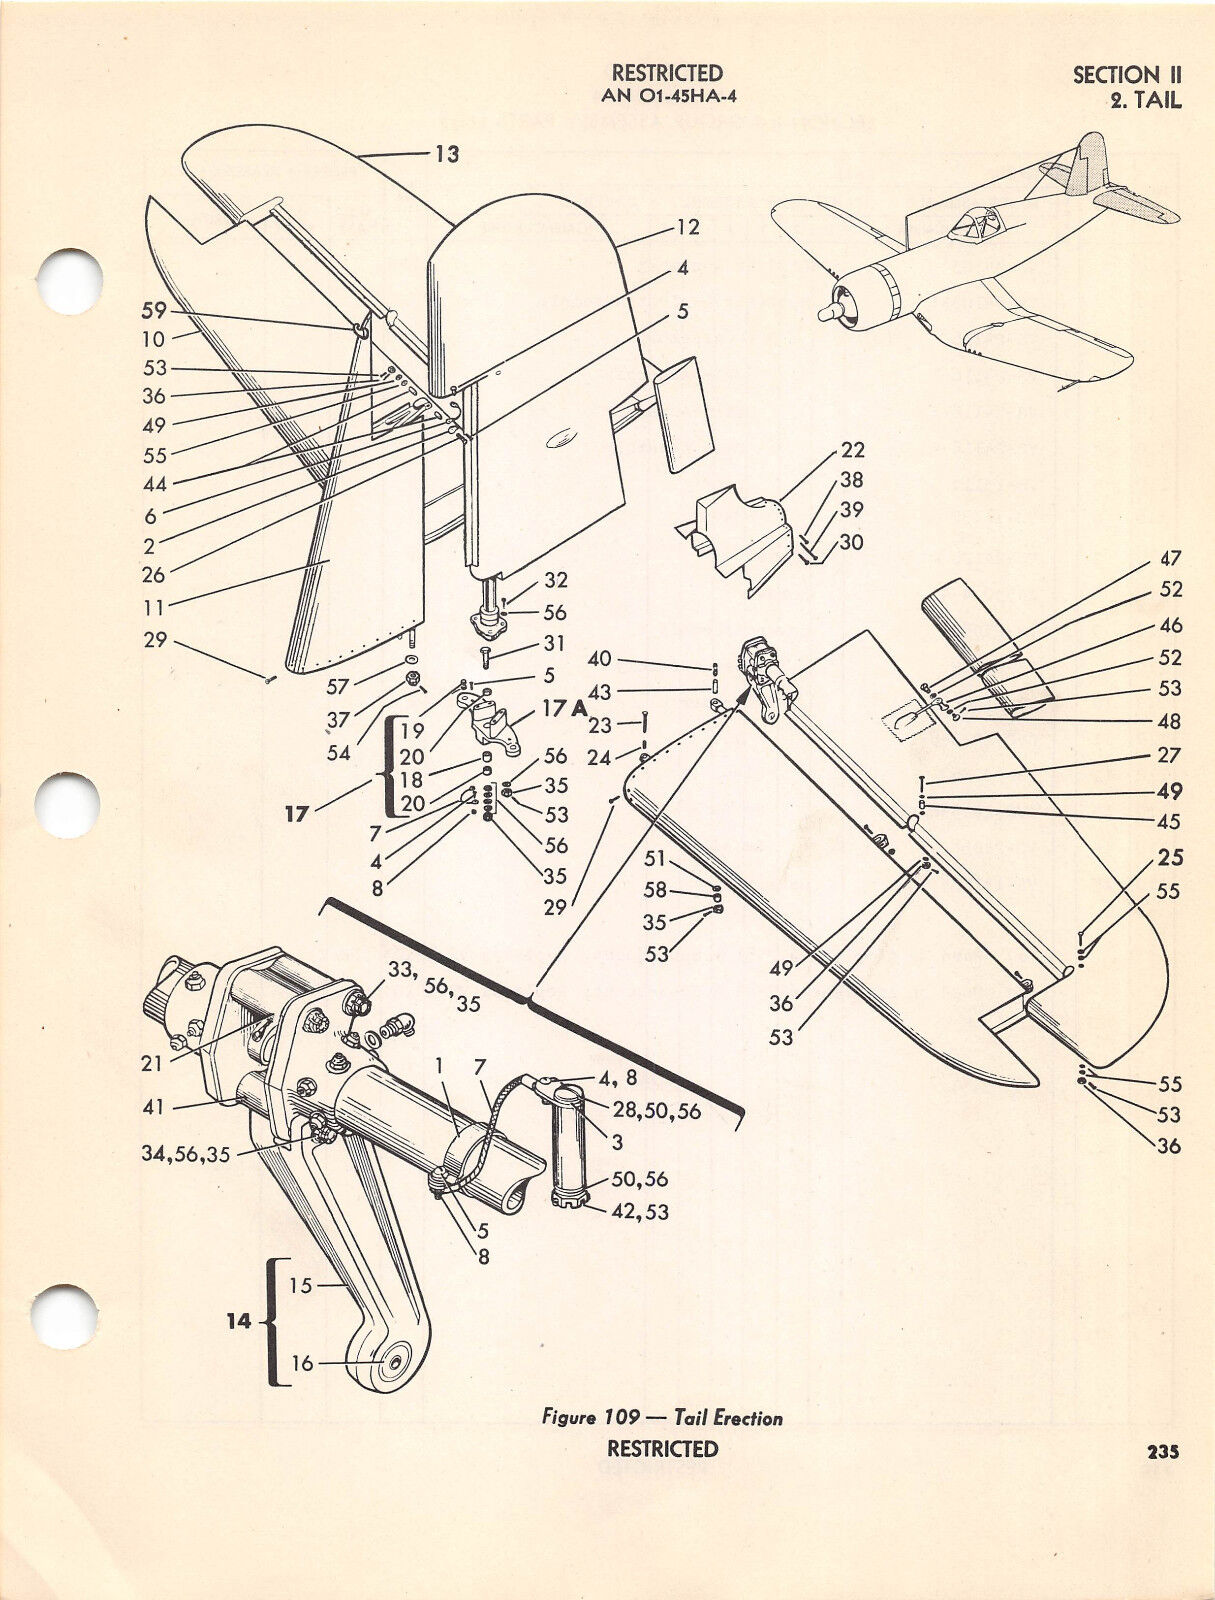 warn 2 5 parts schematic trusted wiring diagrams warn 8274 rebuild parts  f4u 1 corsair aircraft